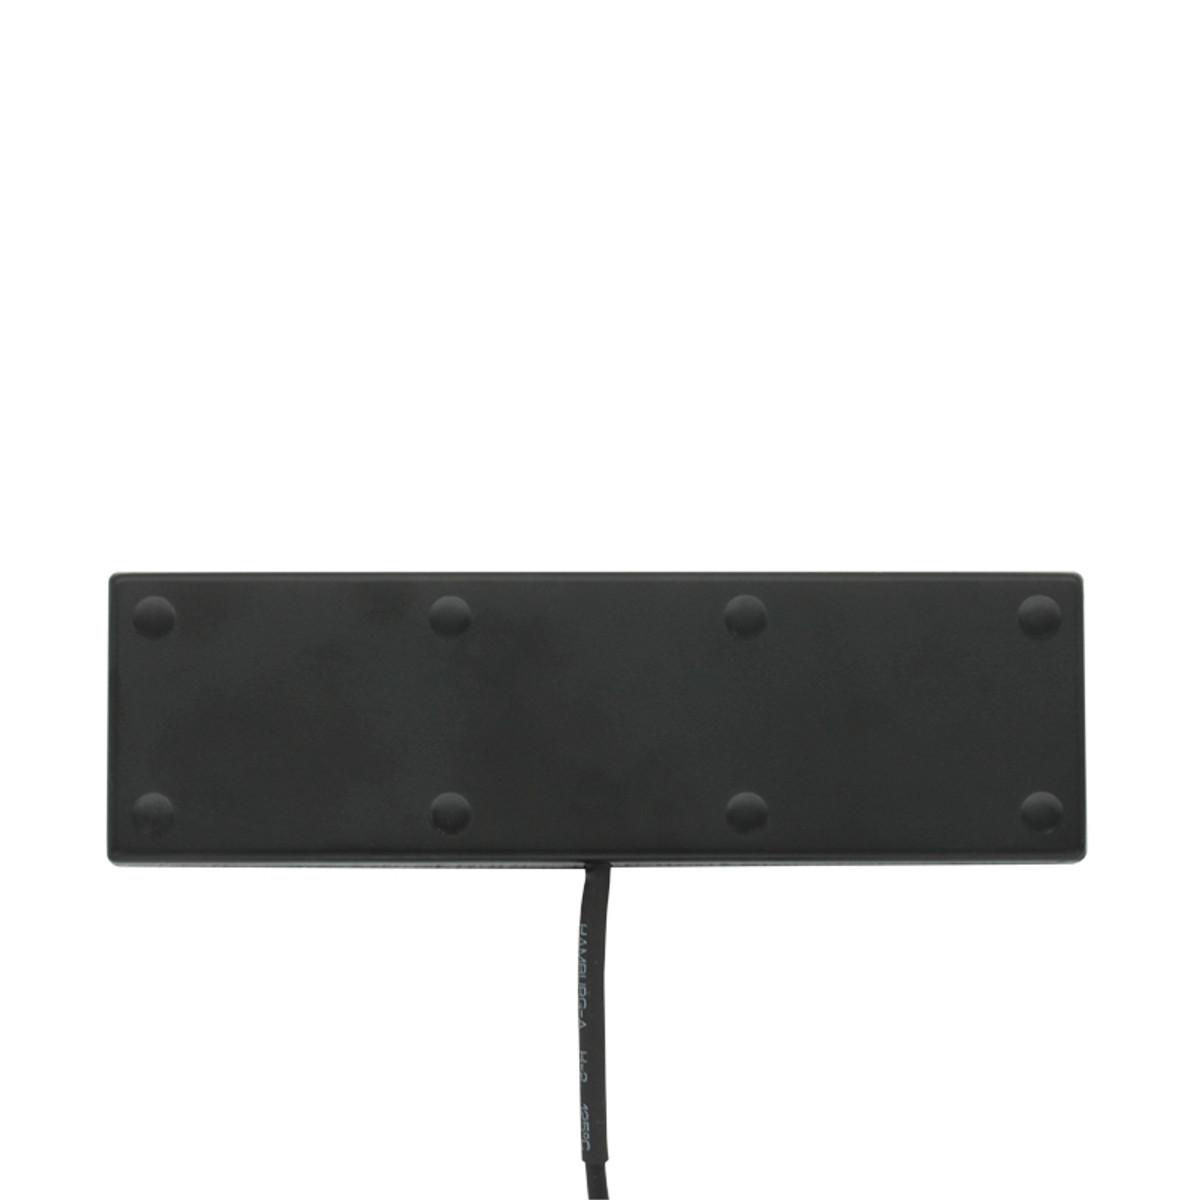 weBoost (Wilson) 301152 Low Profile Antenna, Panel